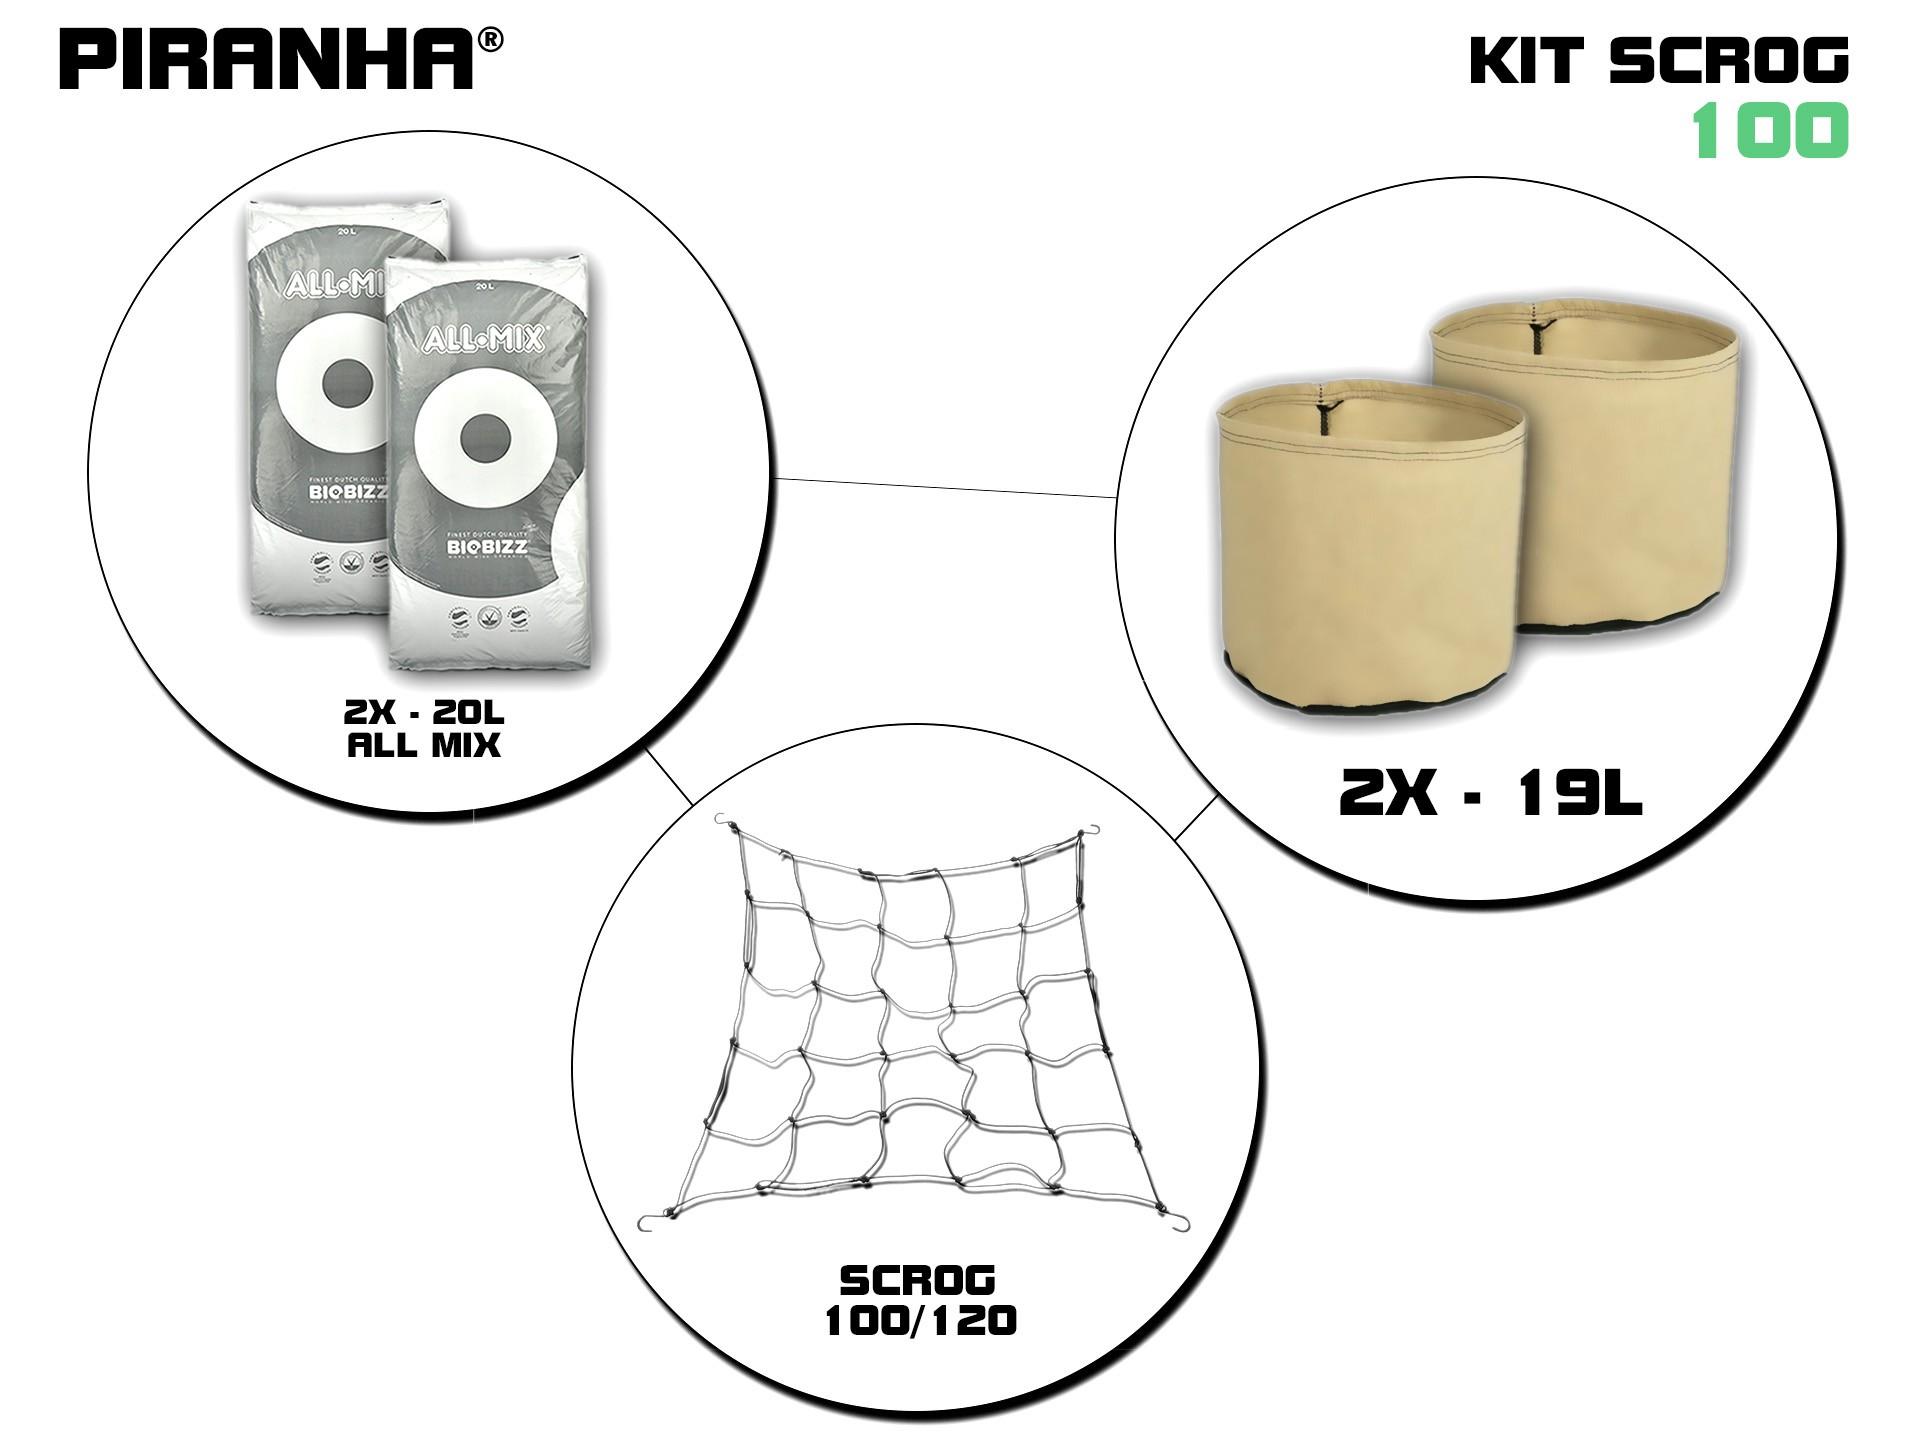 Kit SCROG 100